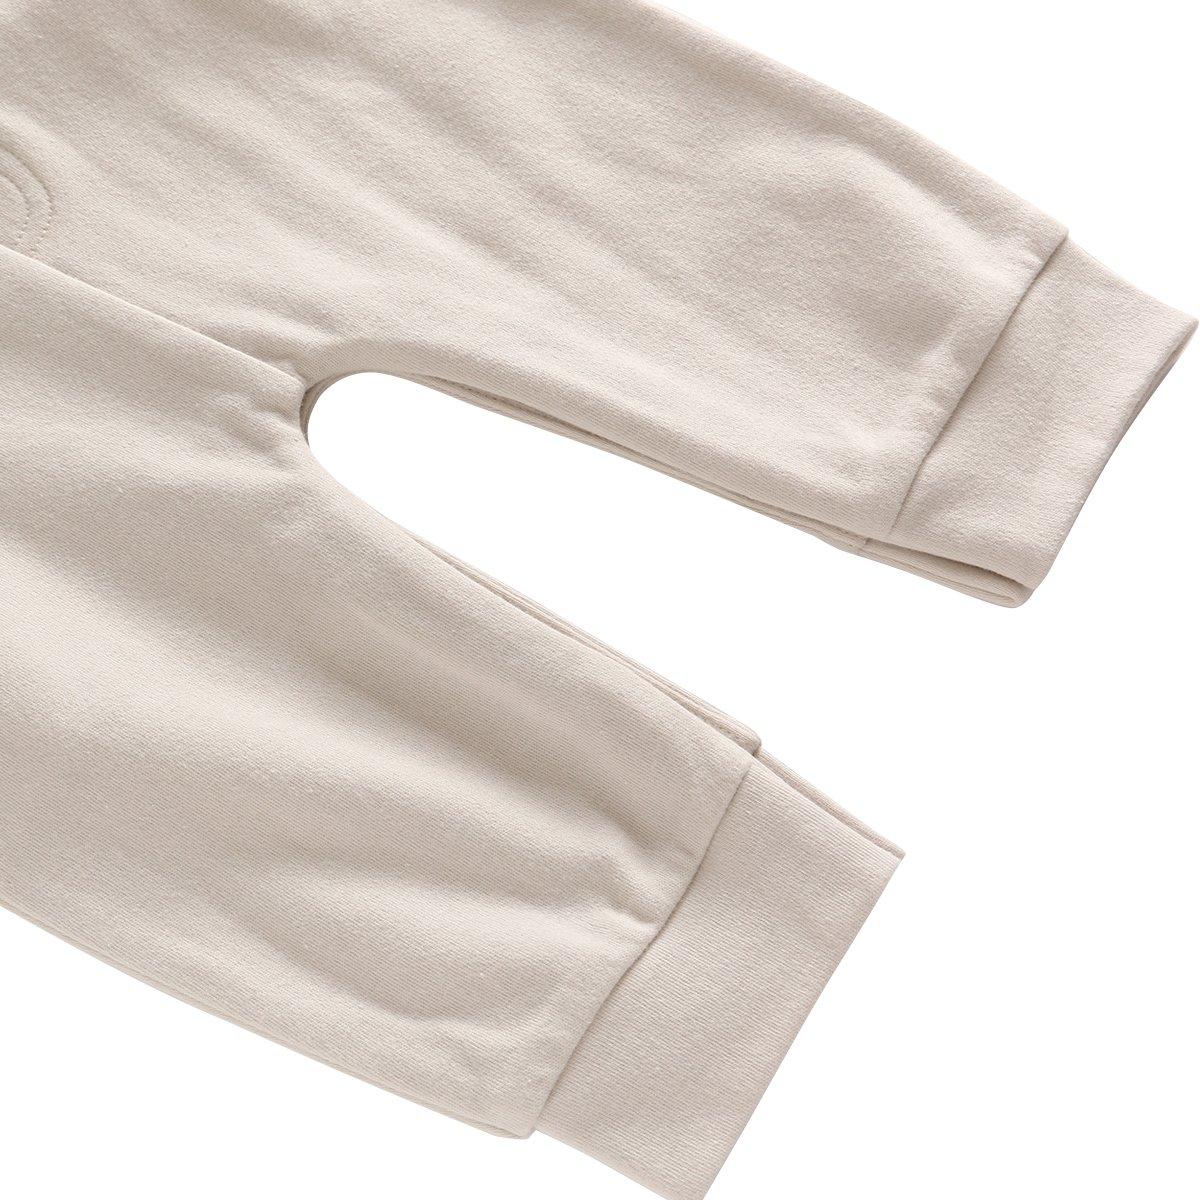 Amazon.com: Bebone Baby Boys Gentleman Suit Long Sleeve Romper with Bowtie for Wedding: Clothing